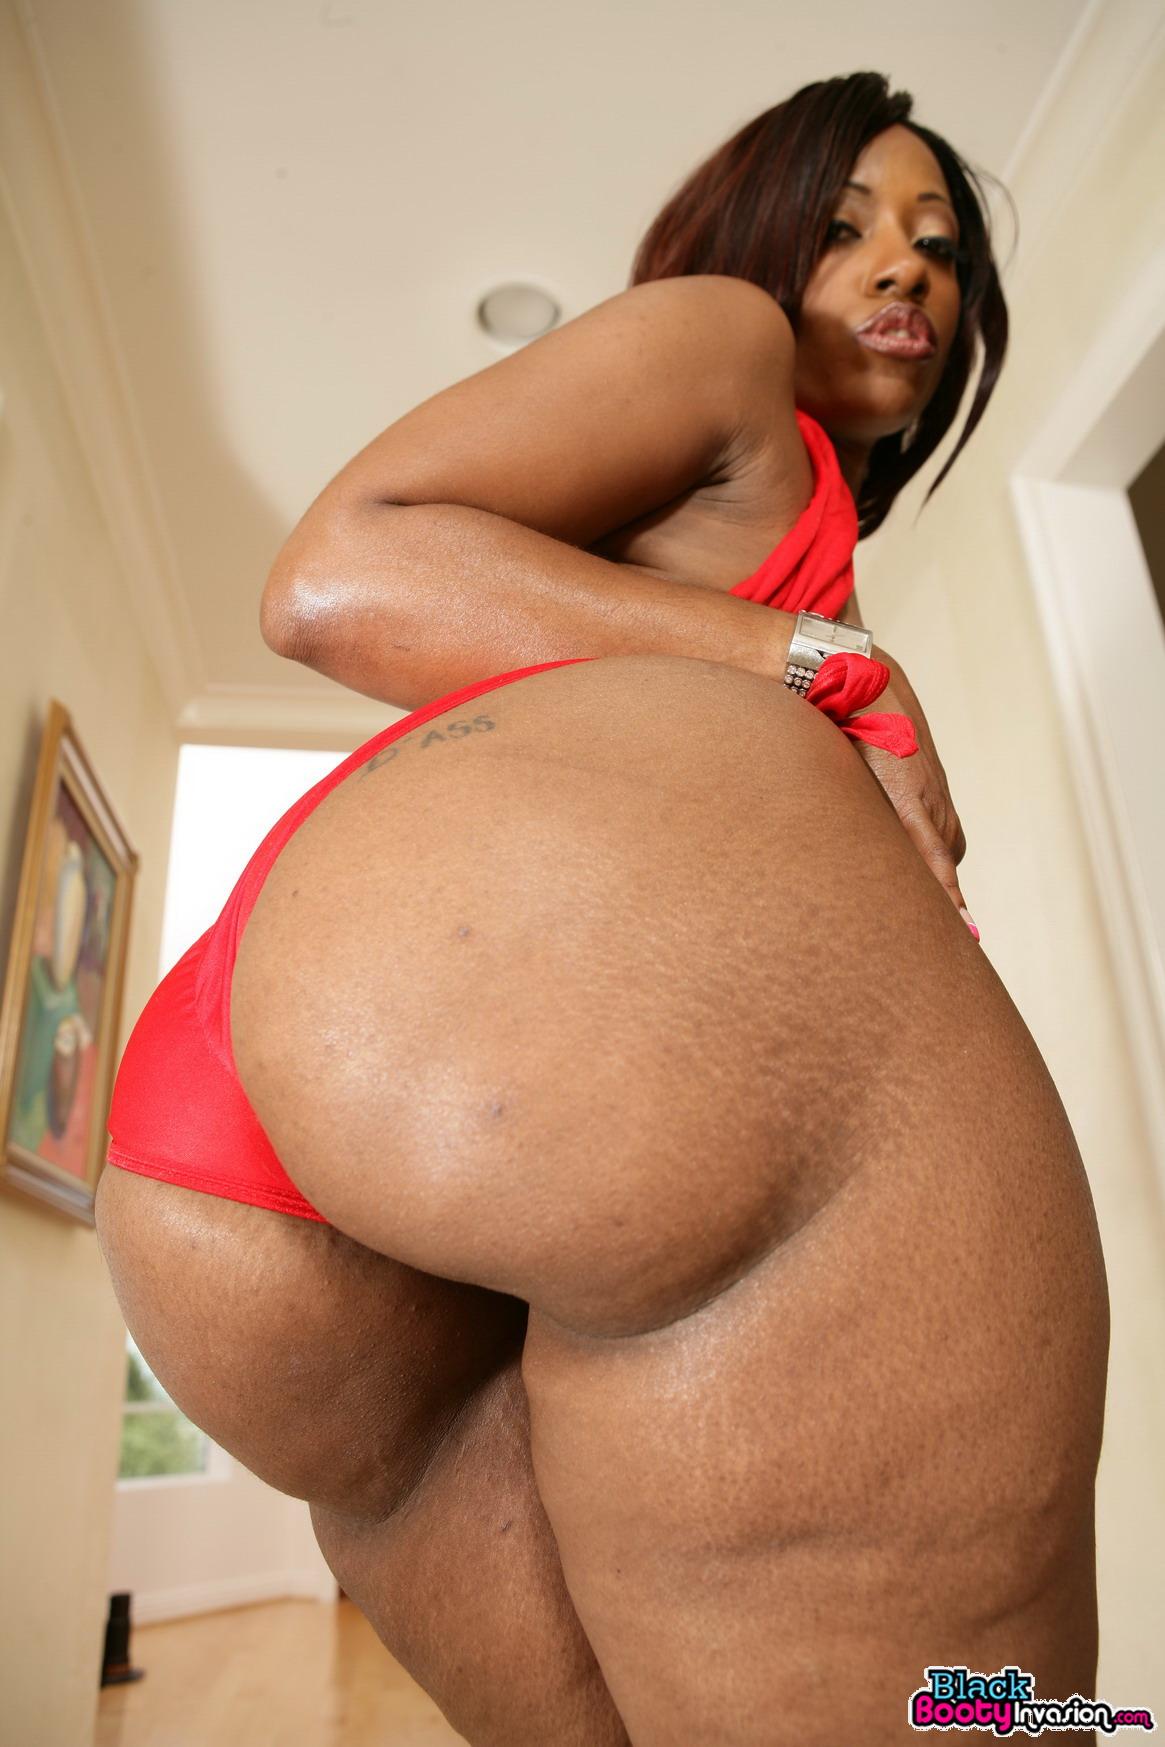 Fat black butt free download sex videos